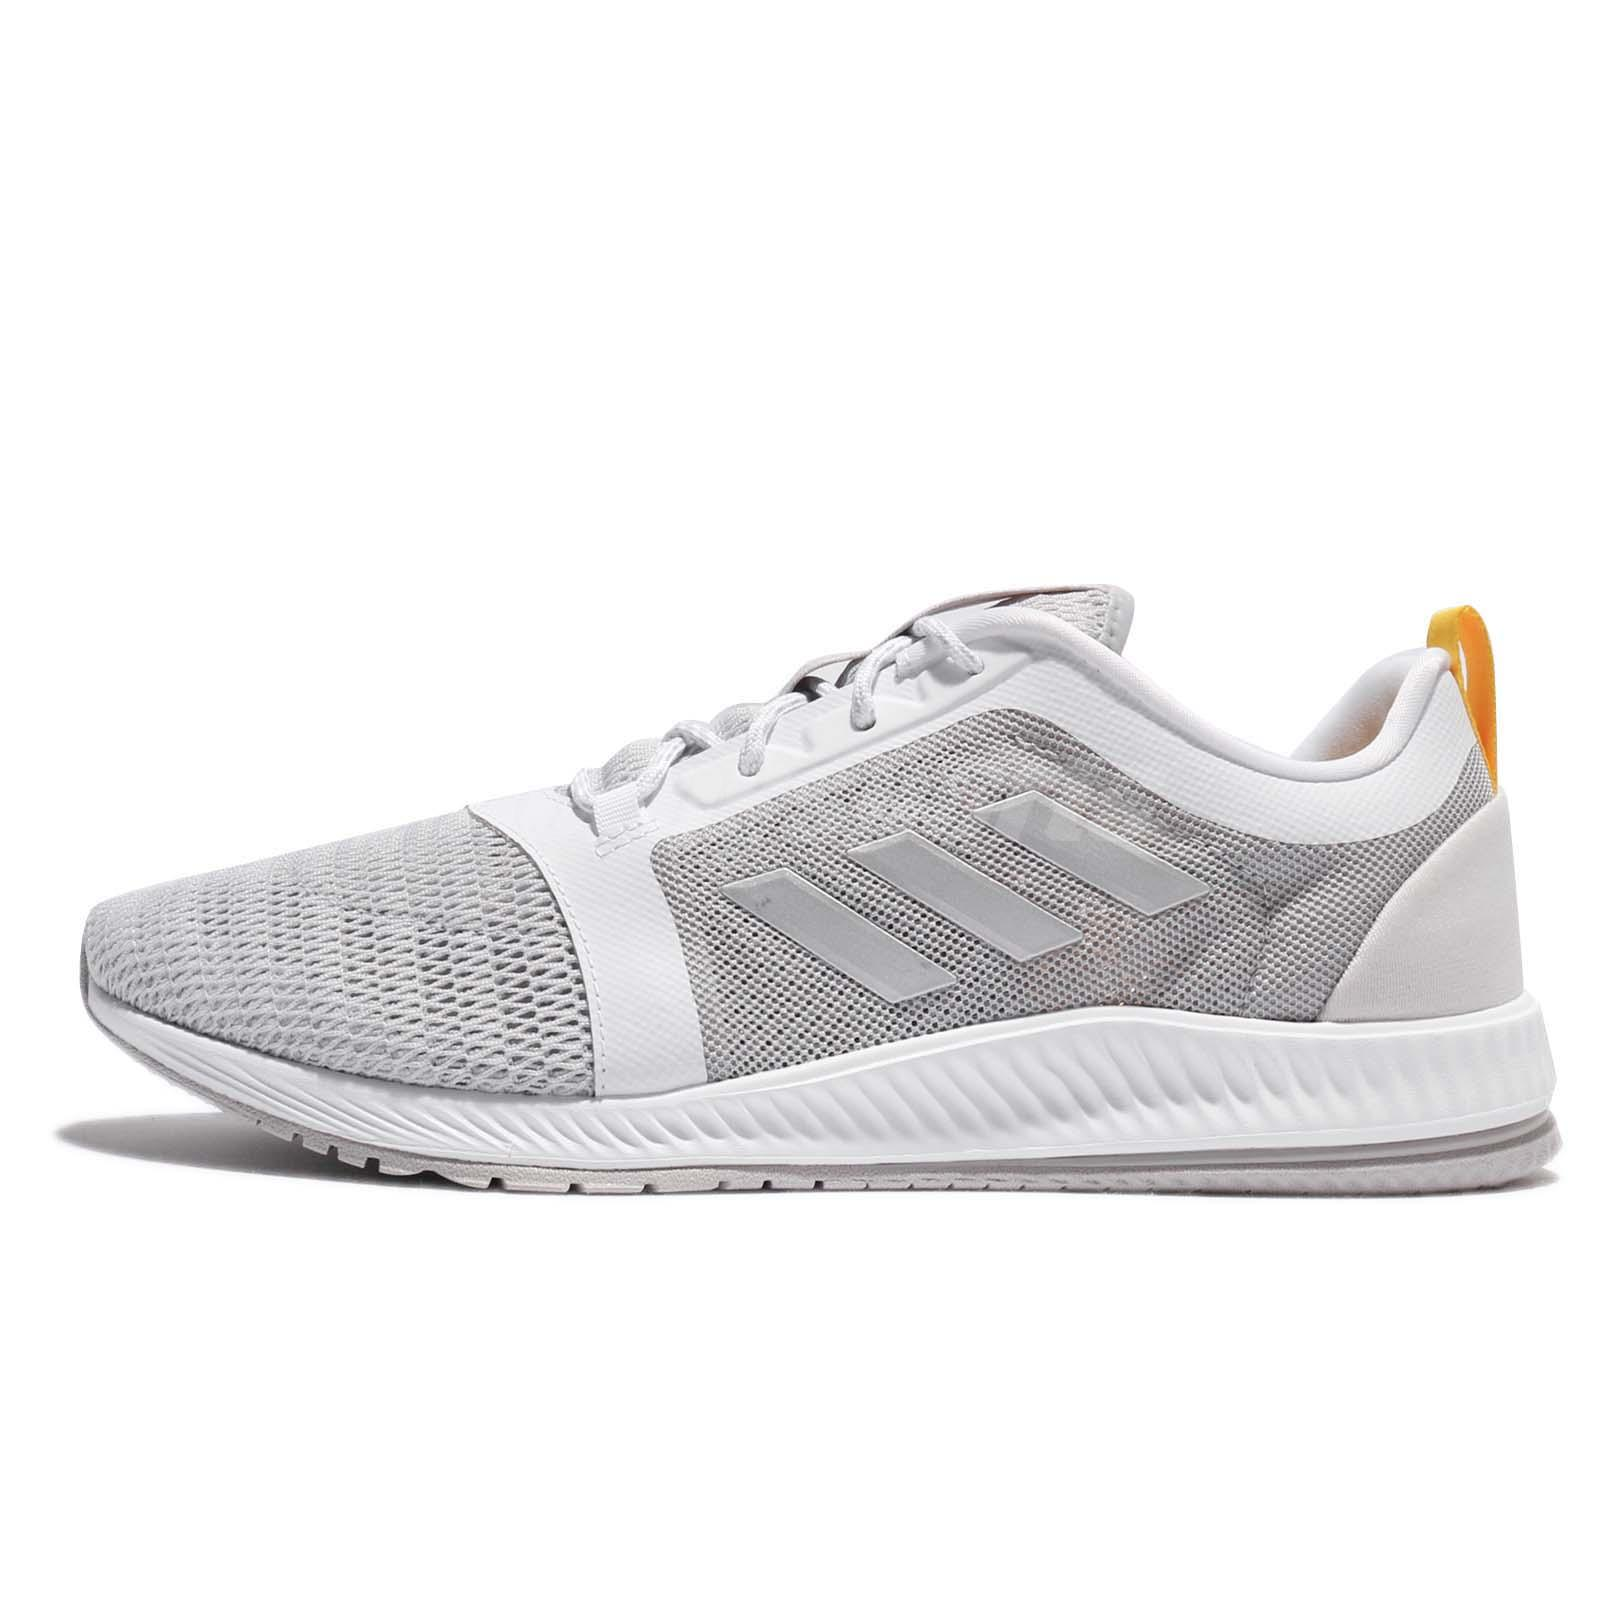 adidas Cool Clima TR White Grey Yellow Women Cross Training Trainers Shoe  BA7989